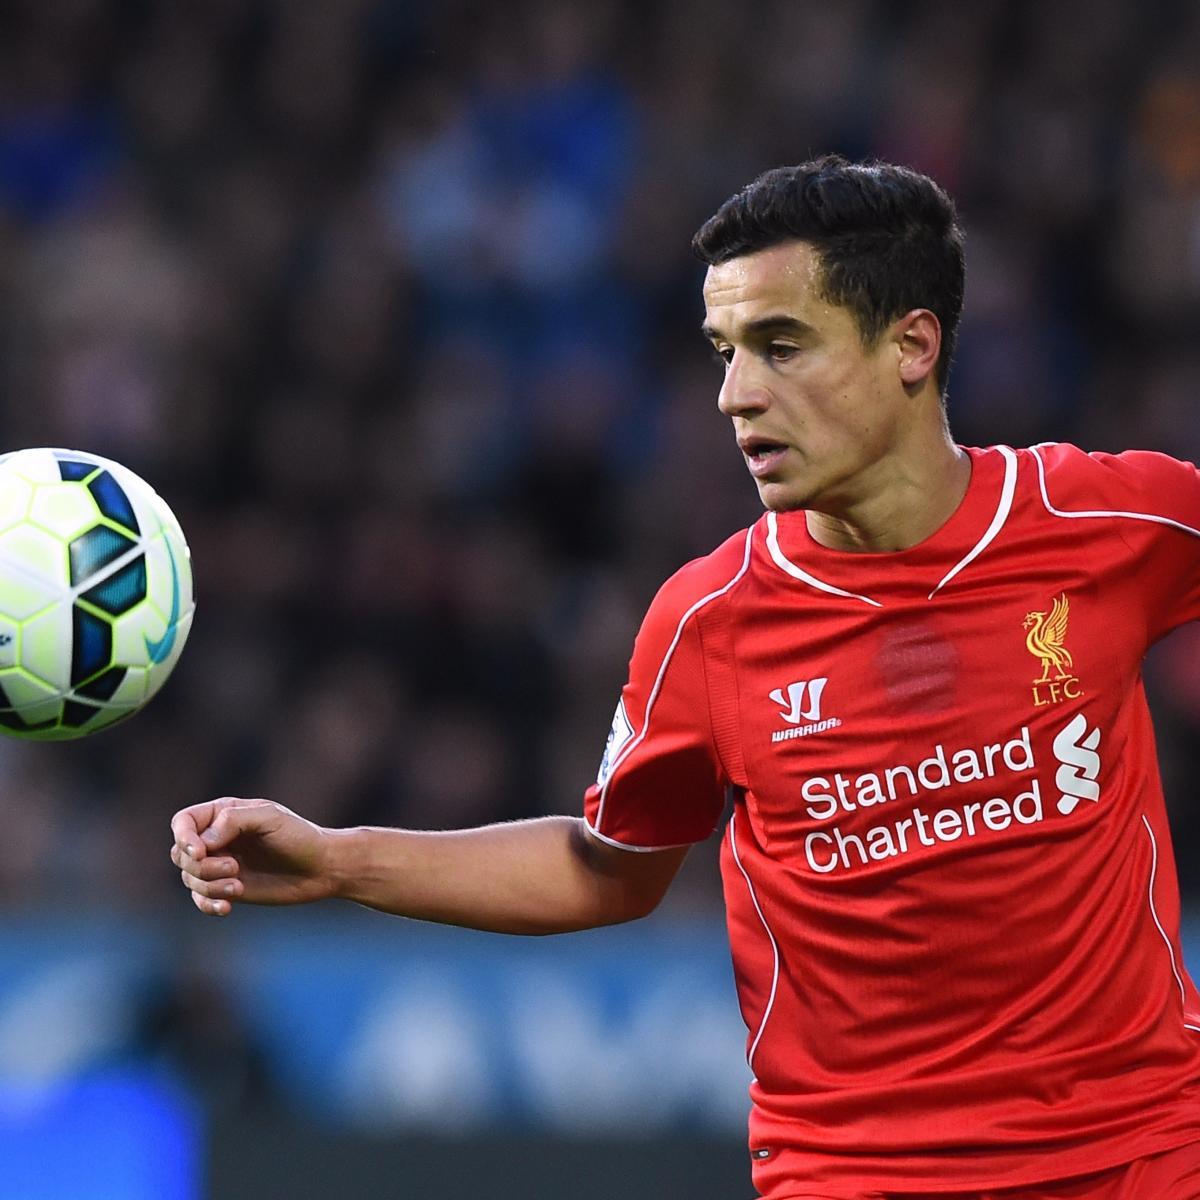 Liverpool 4 0 Borussia Dortmund Match Report Philippe: HJK Vs. Liverpool: Score And Reaction From 2015 Pre-Season